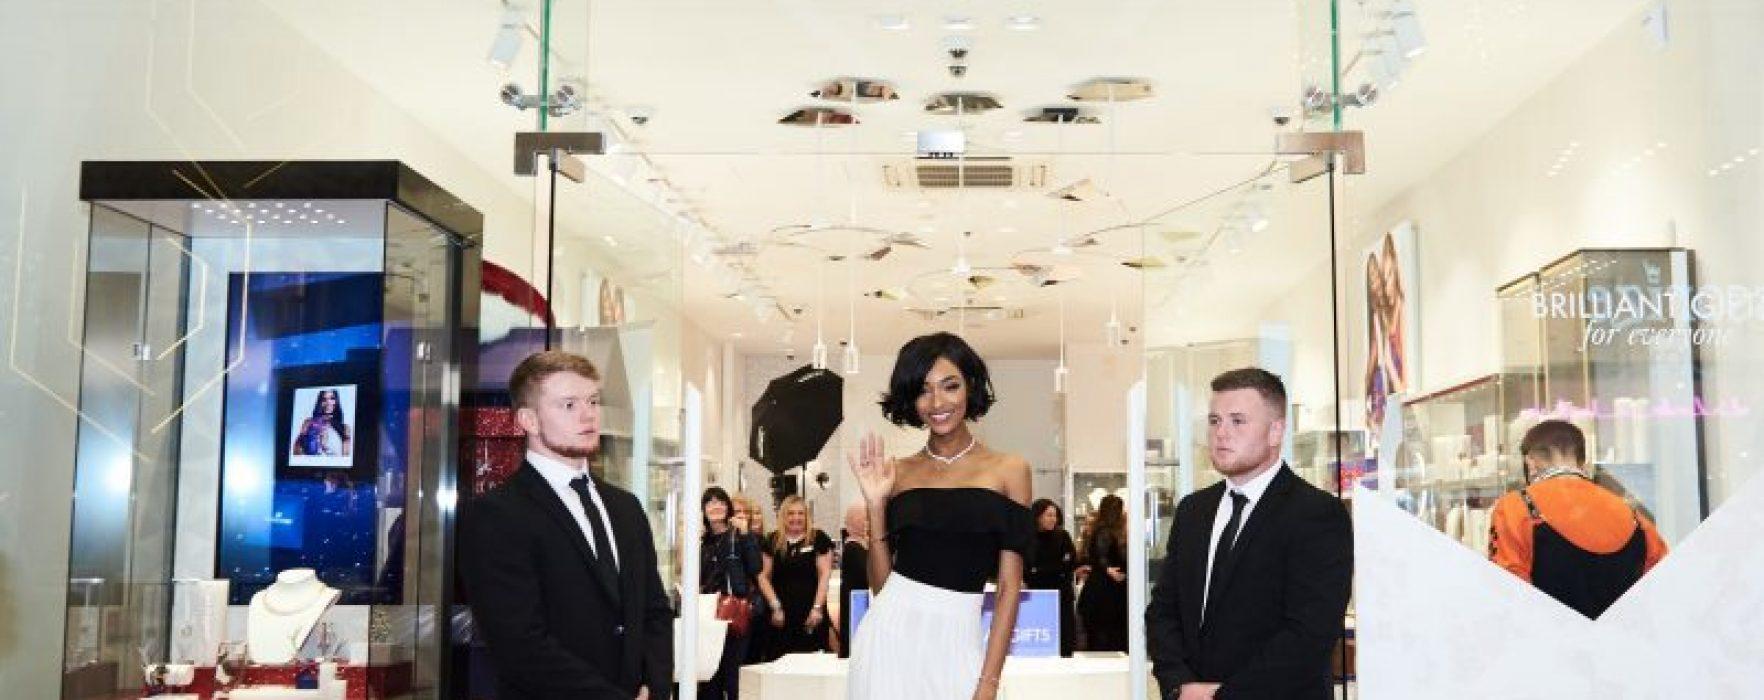 Supermodel Jourdan Dunn Makes An Appearance At Swarovski Manchester